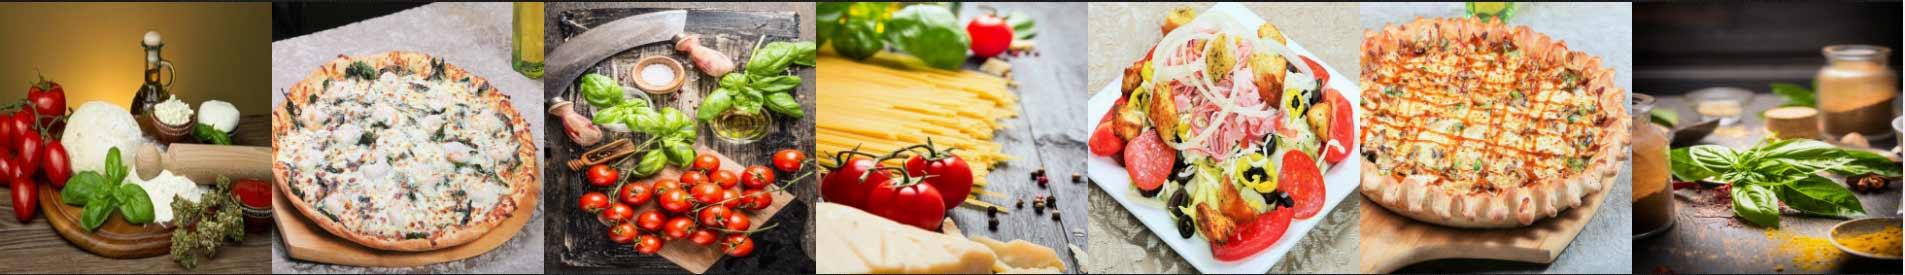 Restaurants Italian Near Me: Pizzeria Chagrin Falls OH